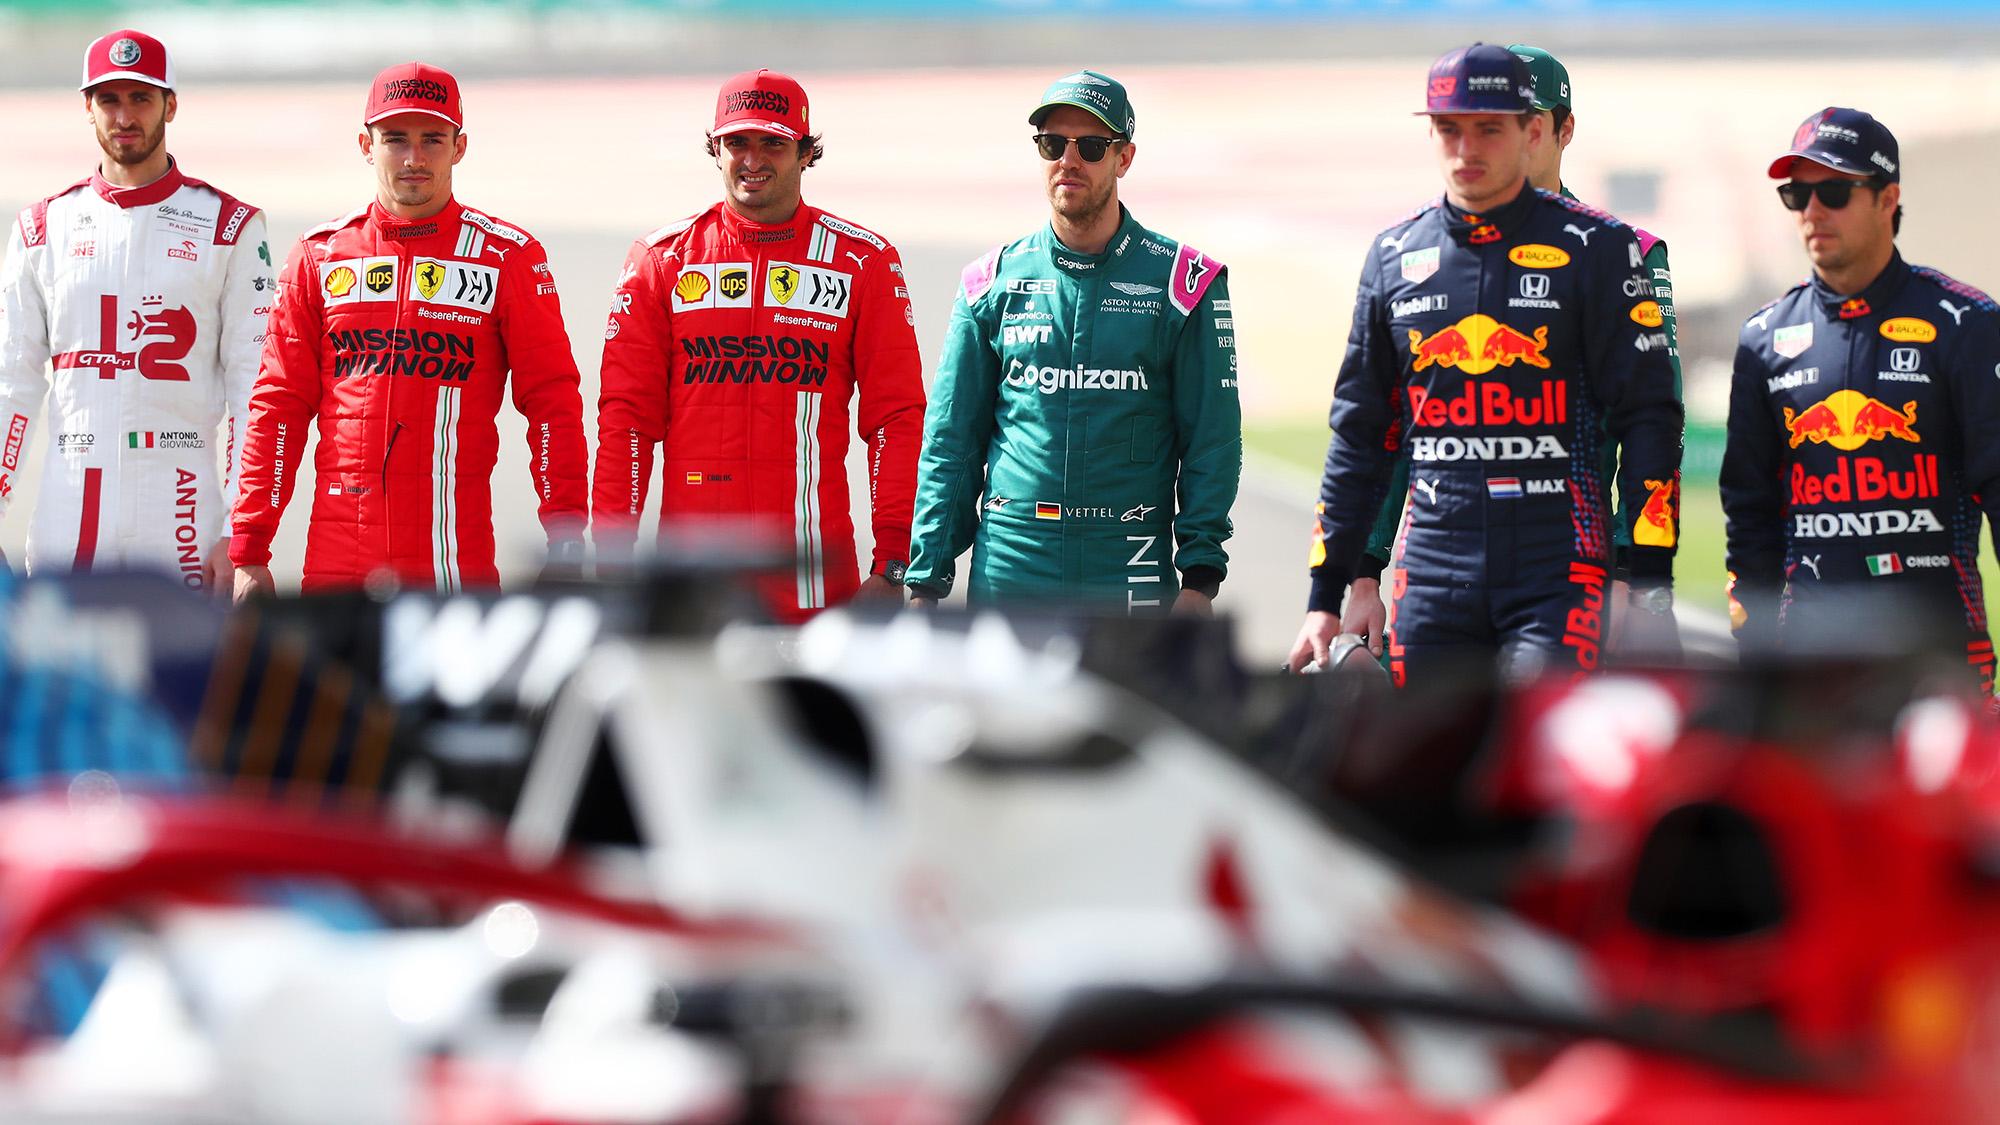 Giovinazzzi Leclerc Sainz Vettel Perez and Verstappen ahead of 2021 F1 season